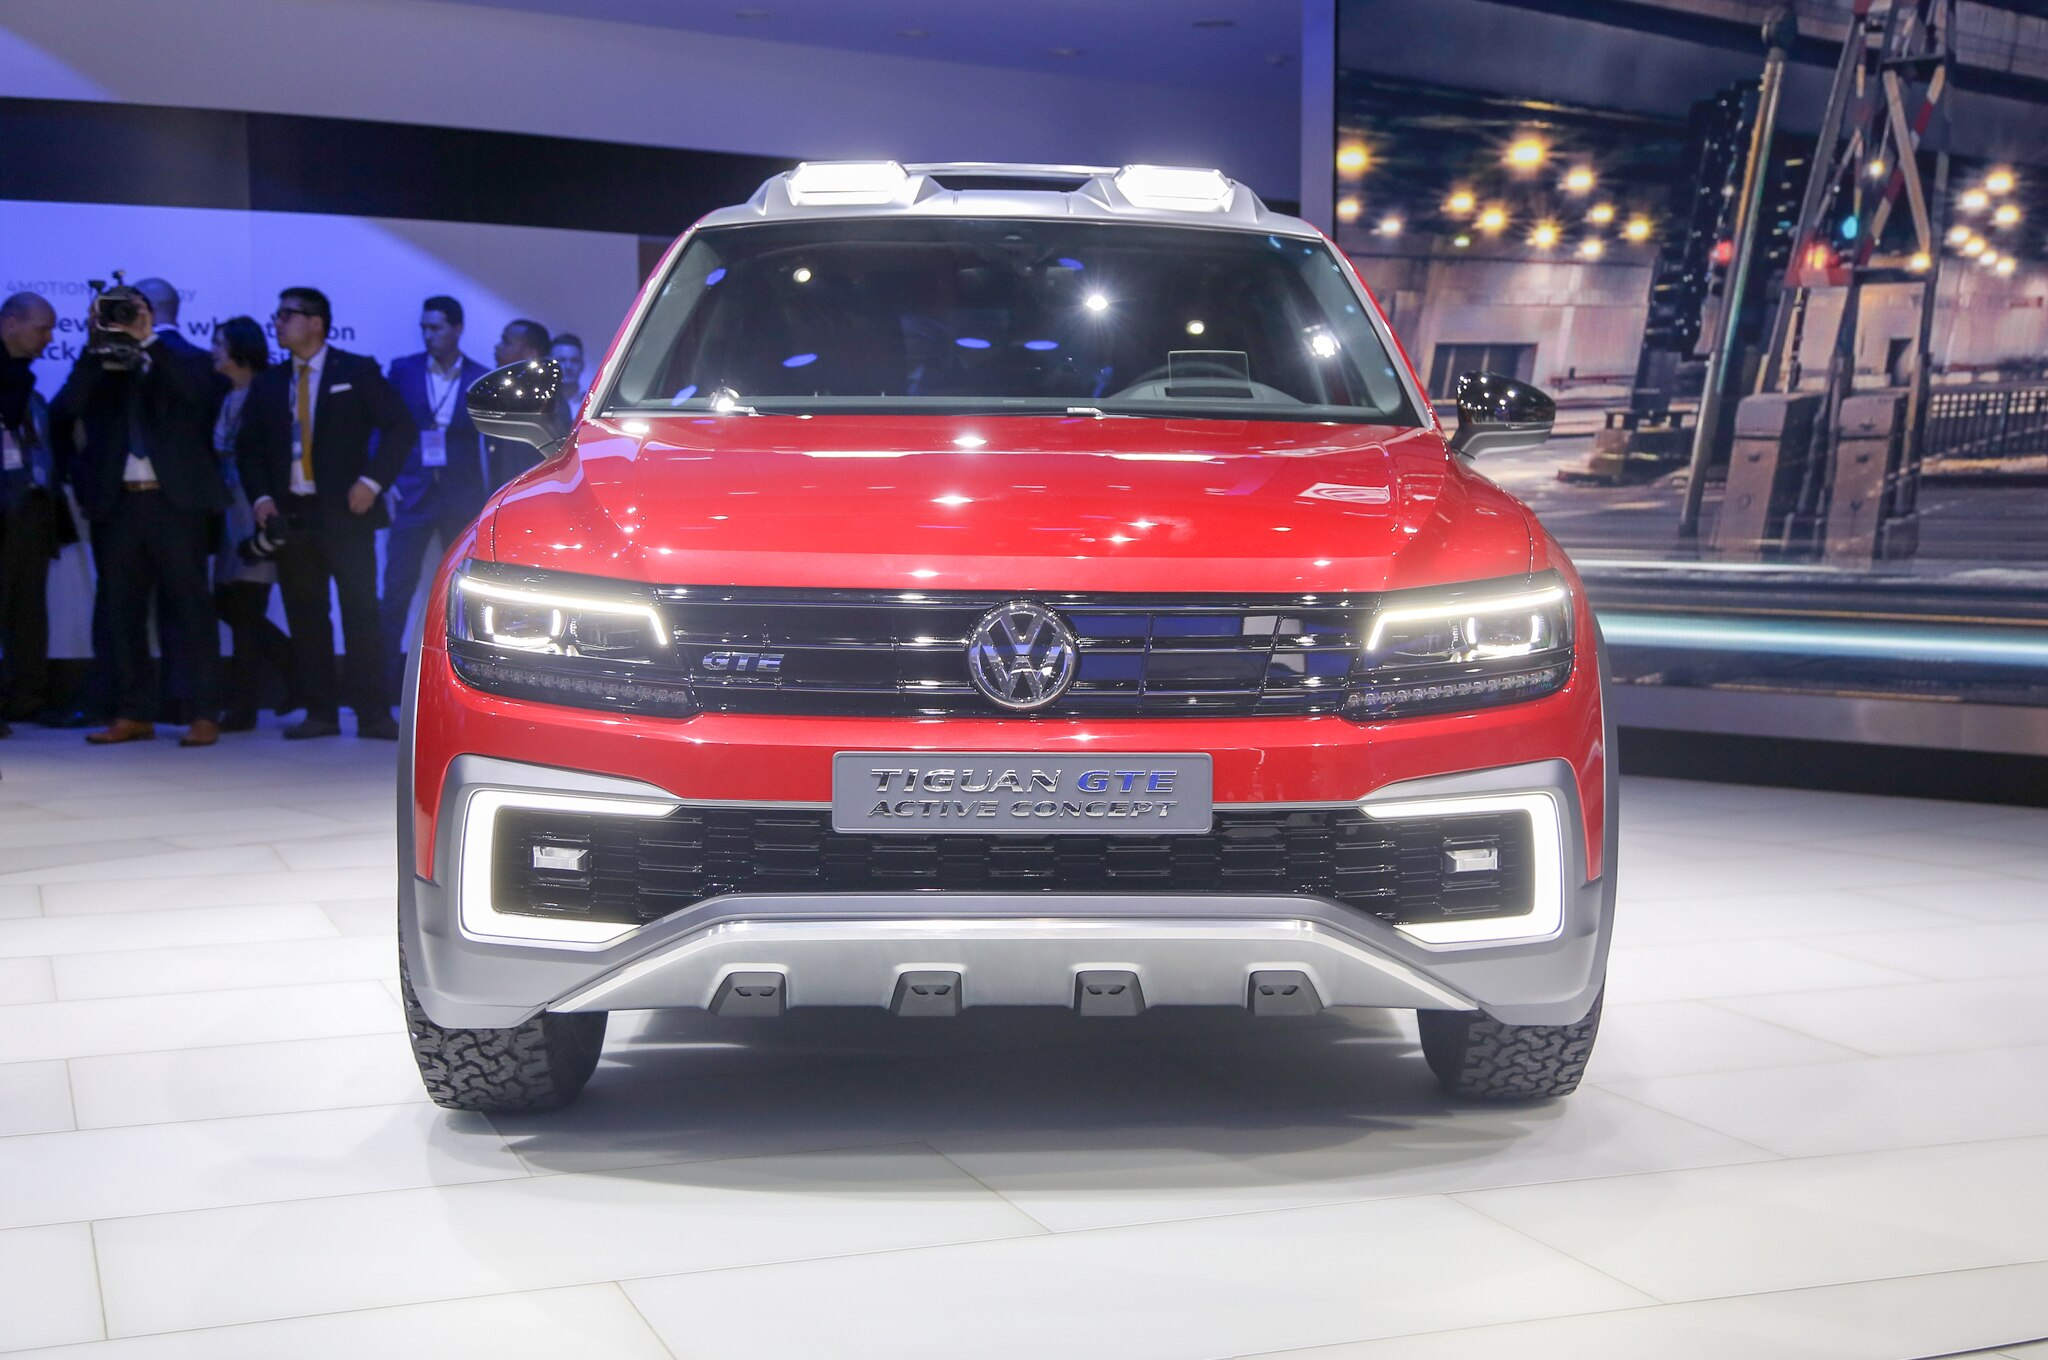 Volkswagen Tiguan Gte Active Concept Front End